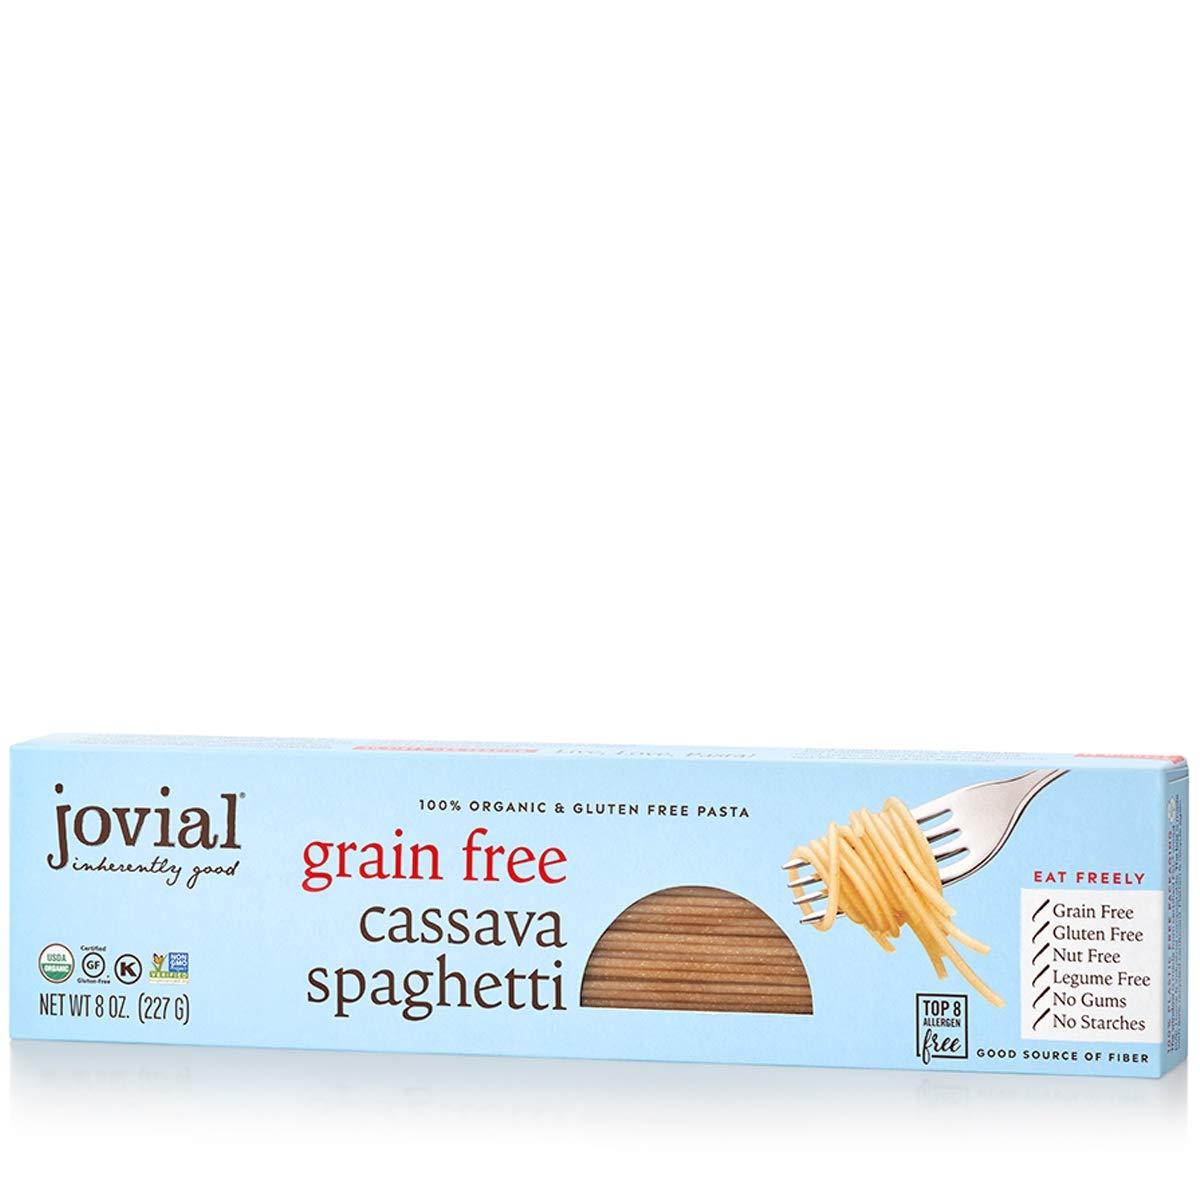 Jovial Grain-Free Cassava Spaghetti | Cassava Pasta | Paleo Pasta | Grain-Free | Certified Gluten-Free | 100% Organic Pasta | USDA Certified Organic | Non-GMO | High-Fiber | 8 oz (1 pack)